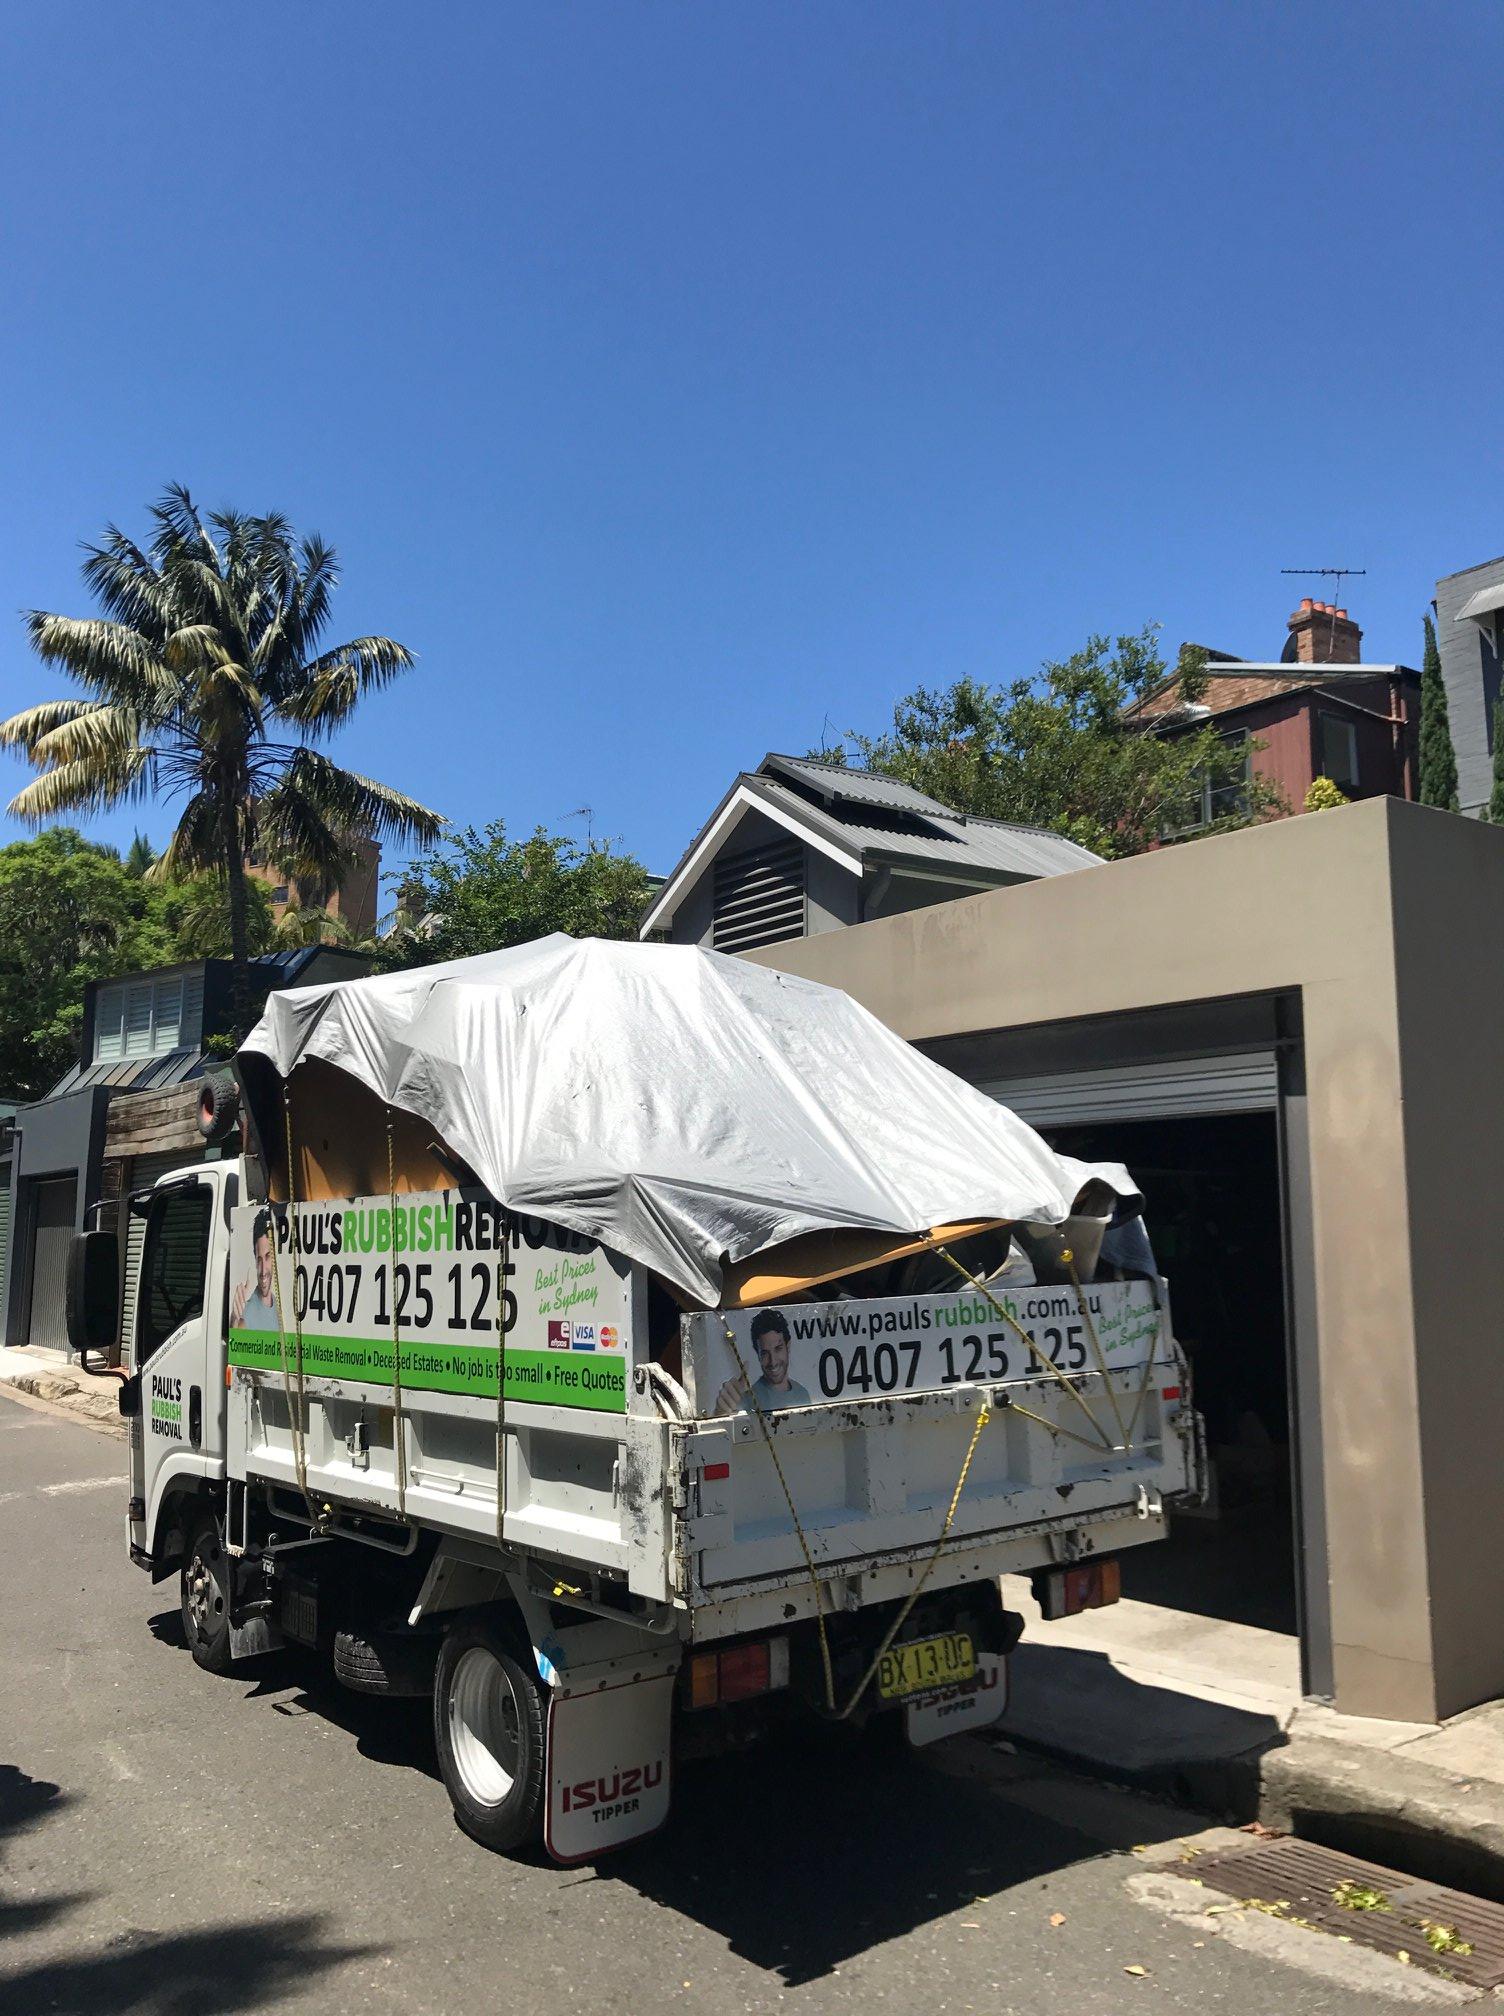 pauls rubbish removal full truck